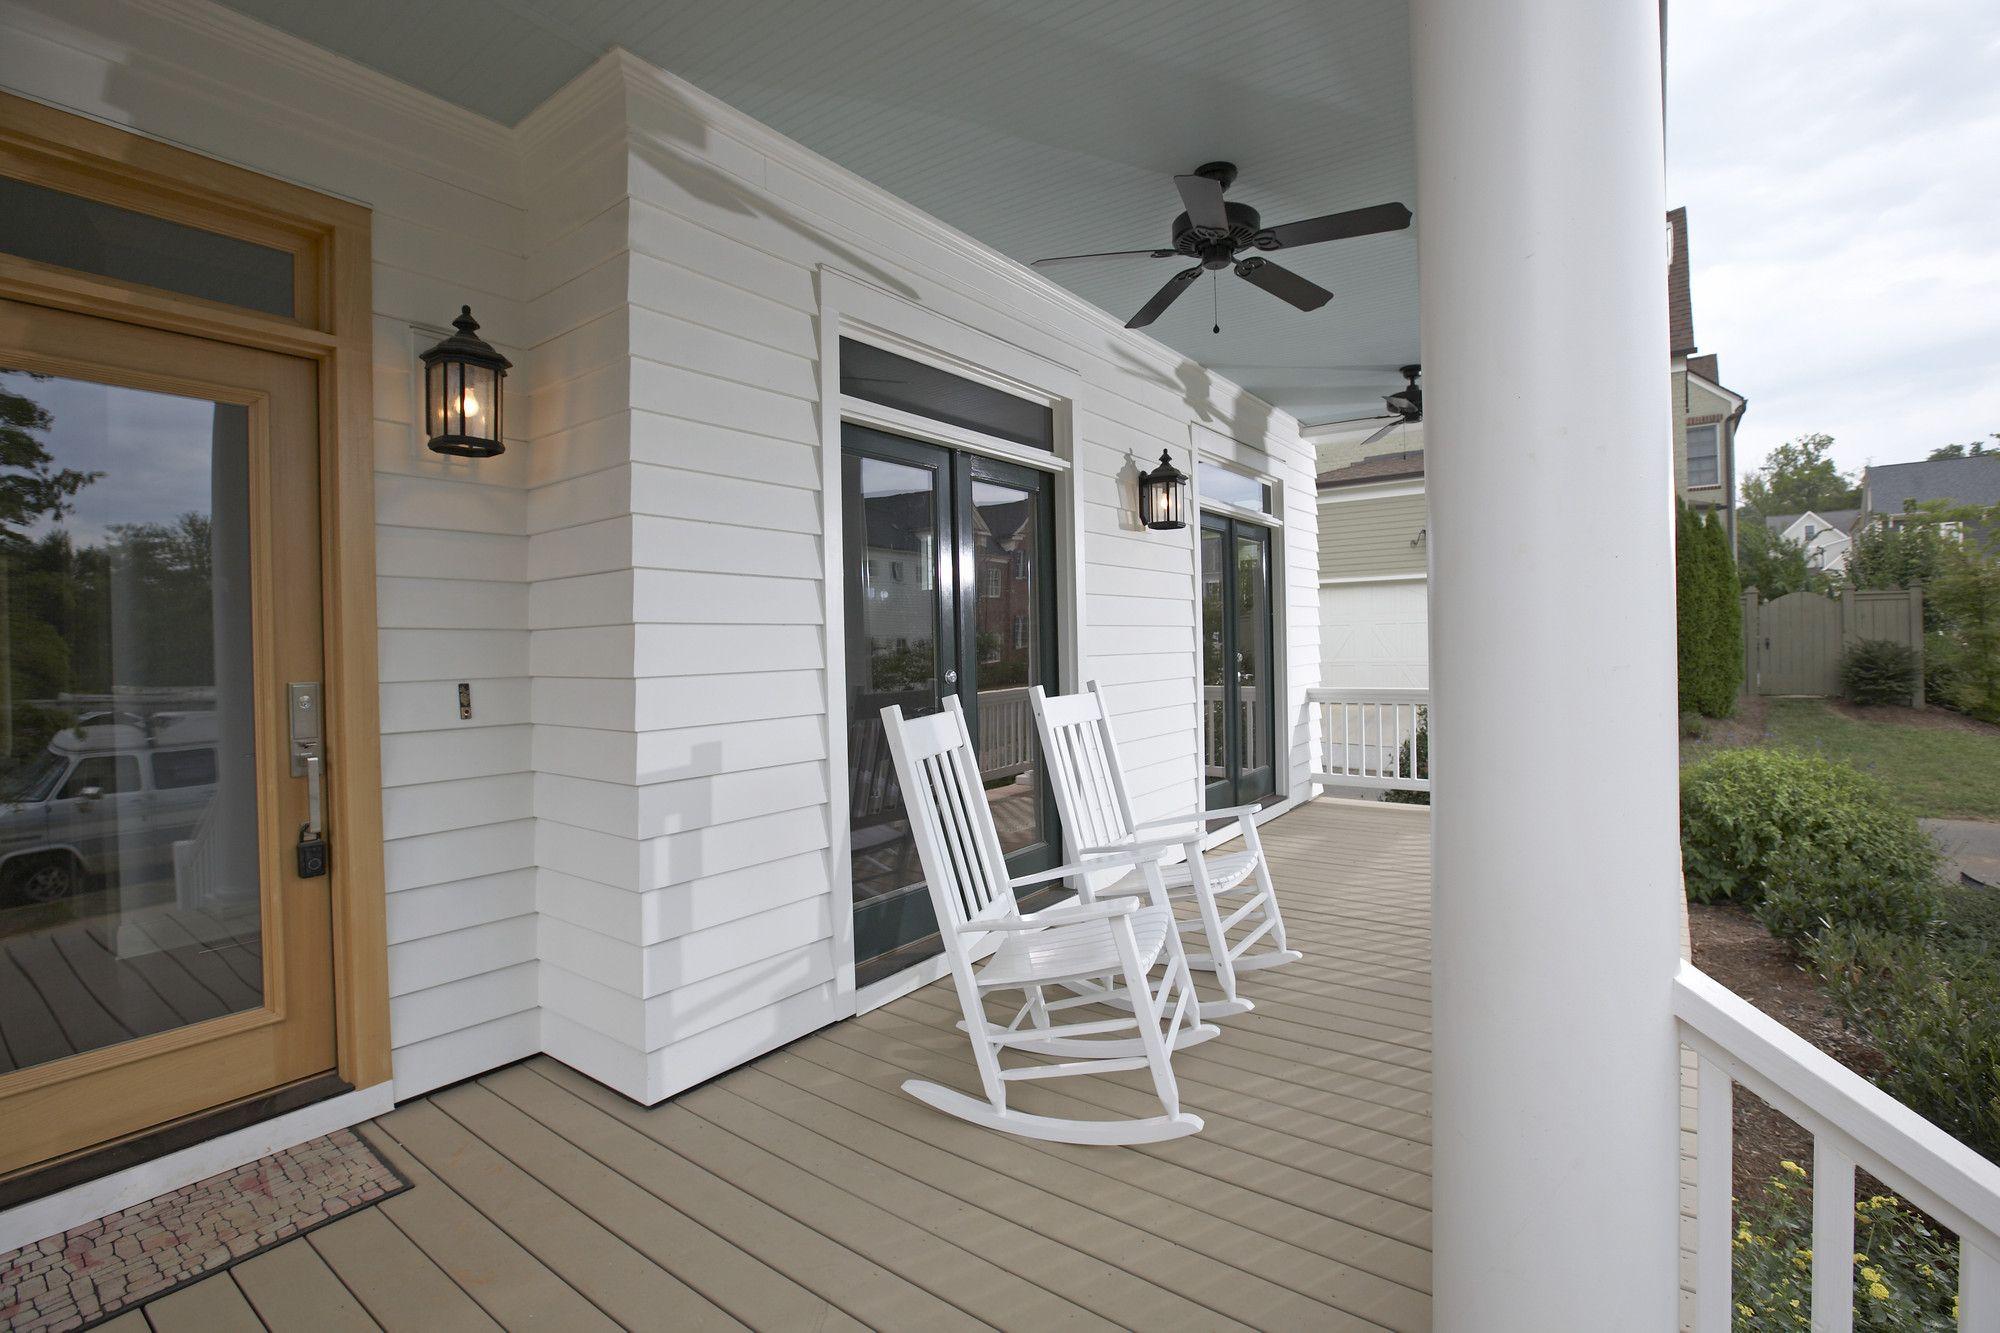 House colors on pinterest paint colors craftsman and james hardie - James Hardie Design Ideas Photo Showcase